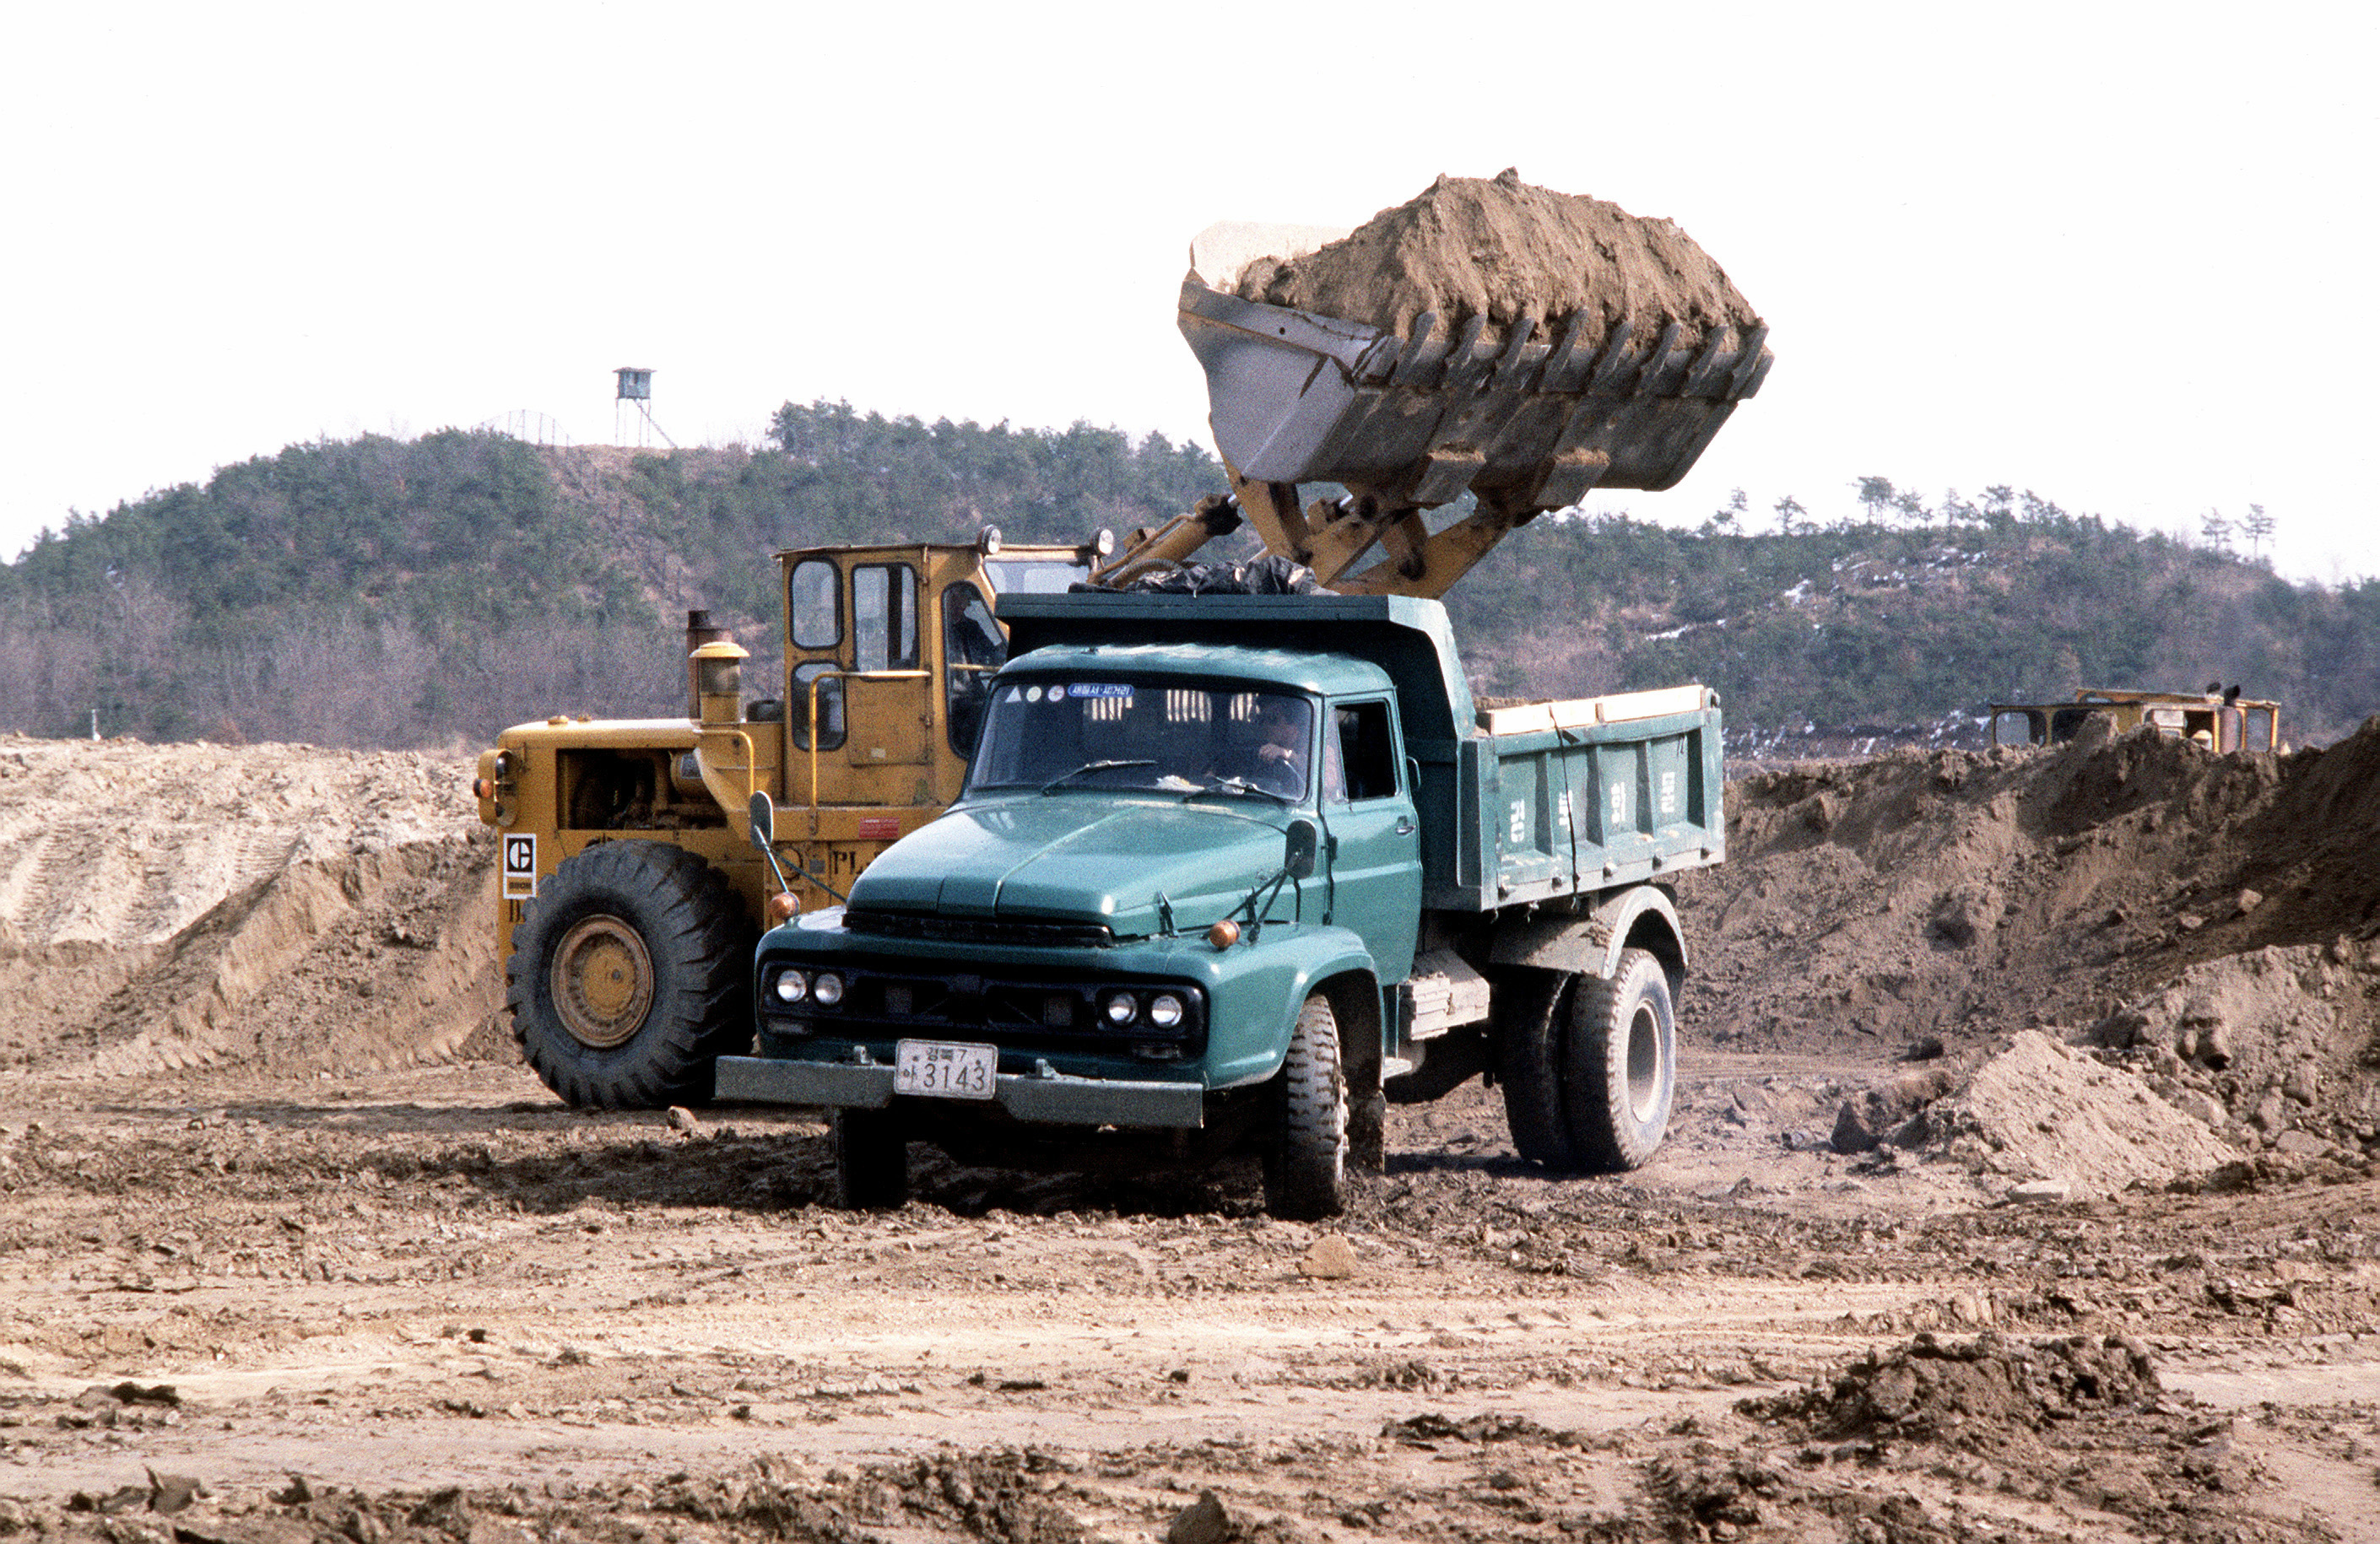 file earth moving equipment and dump trucks move dirt jpeg wikimedia commons. Black Bedroom Furniture Sets. Home Design Ideas